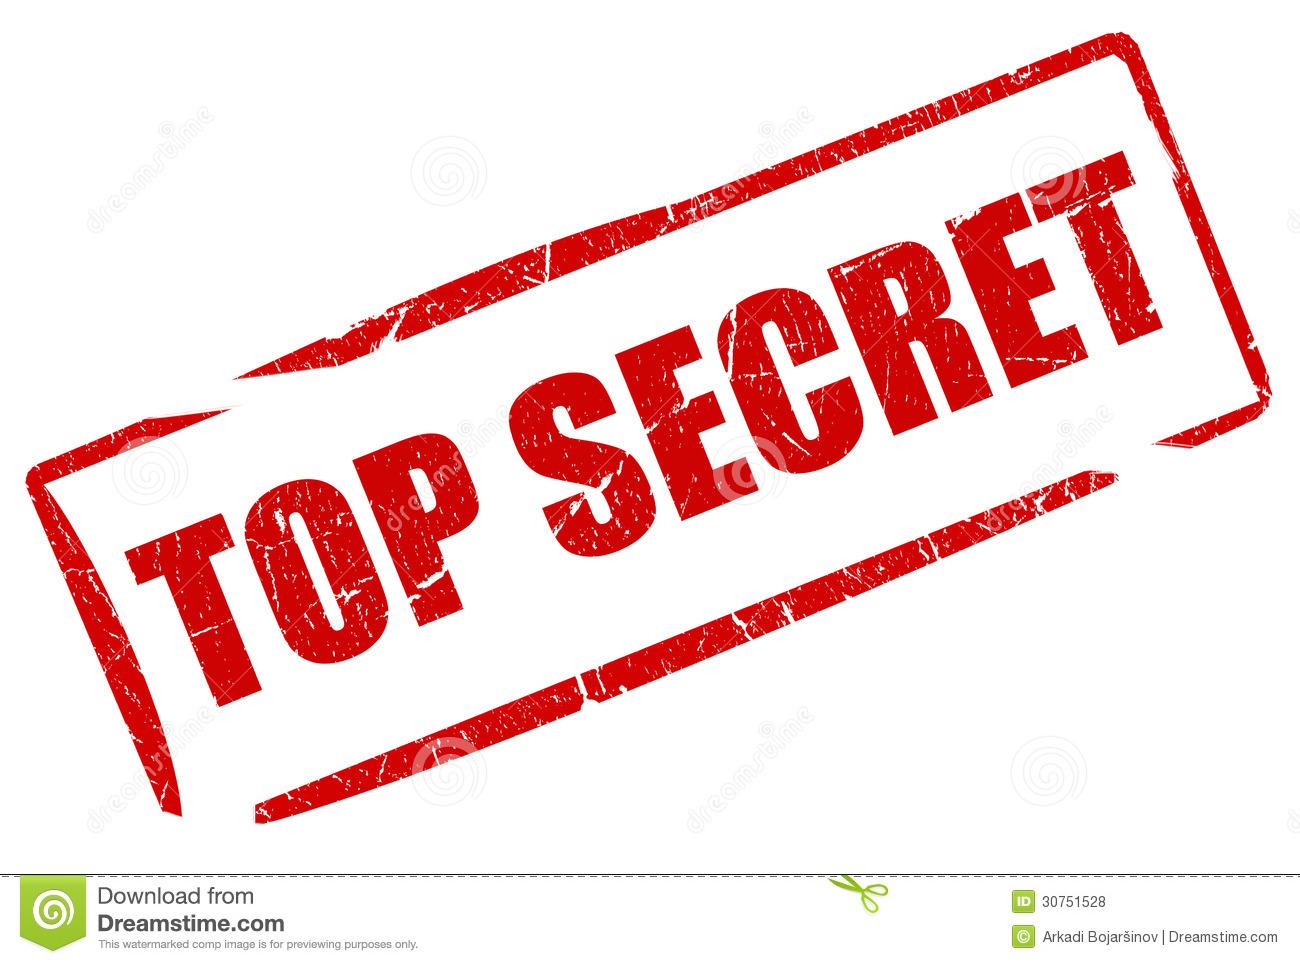 Secrecy clipart.